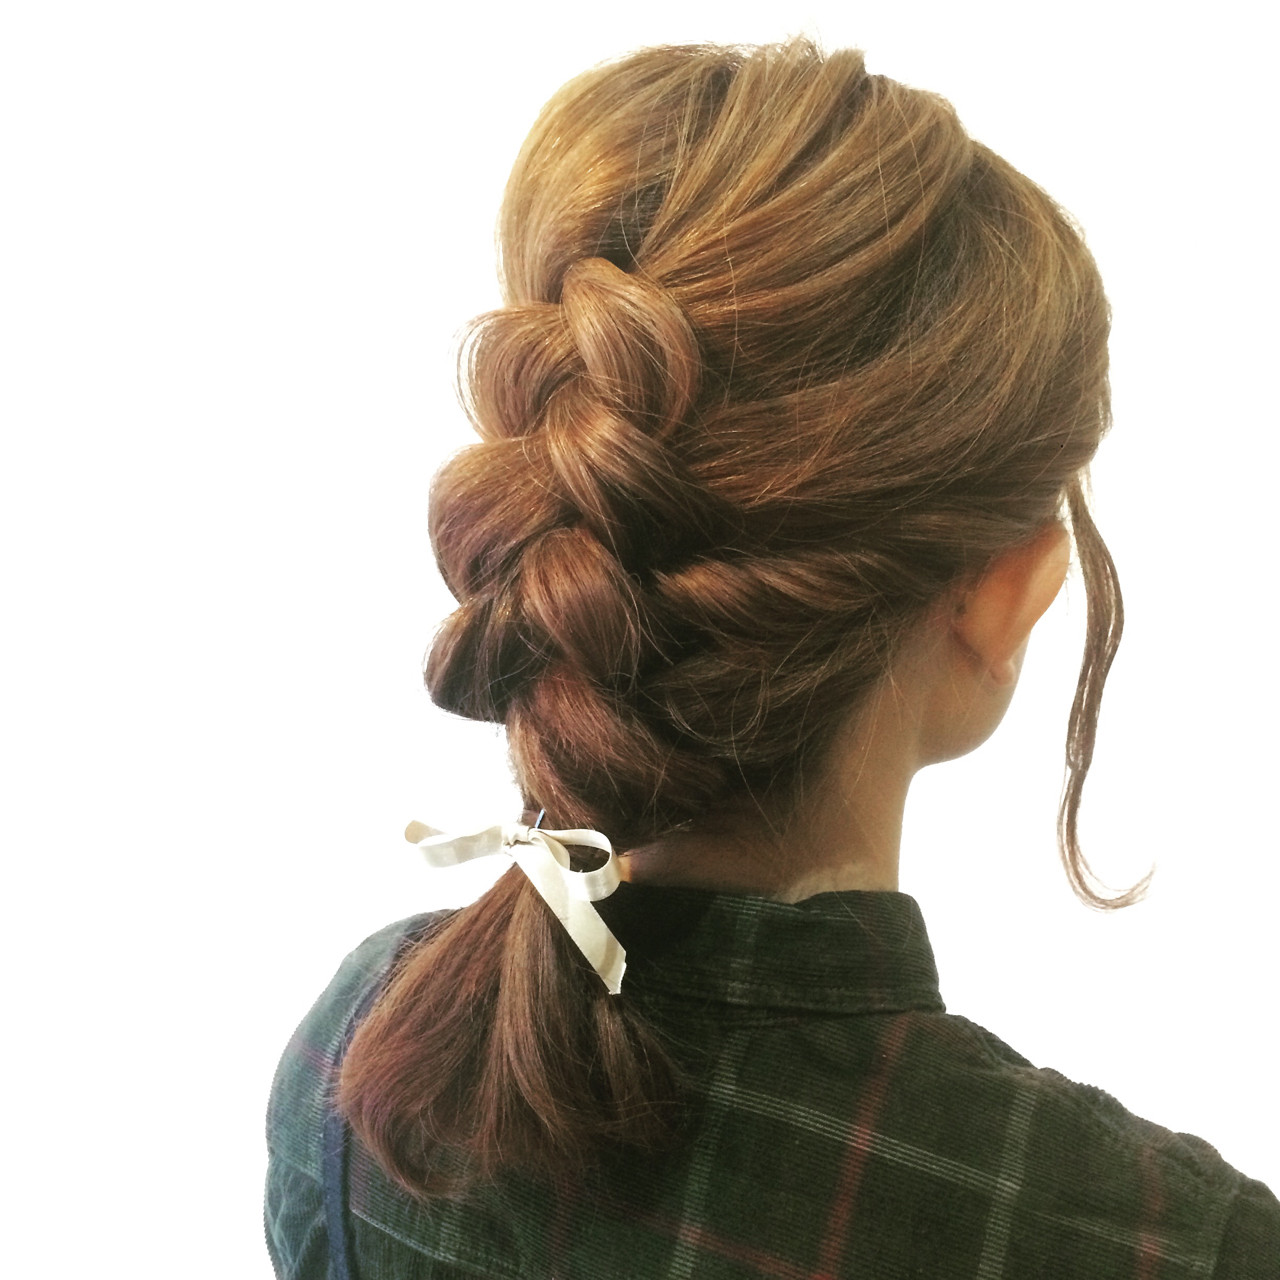 尾崎裕介 / Quatre hair design